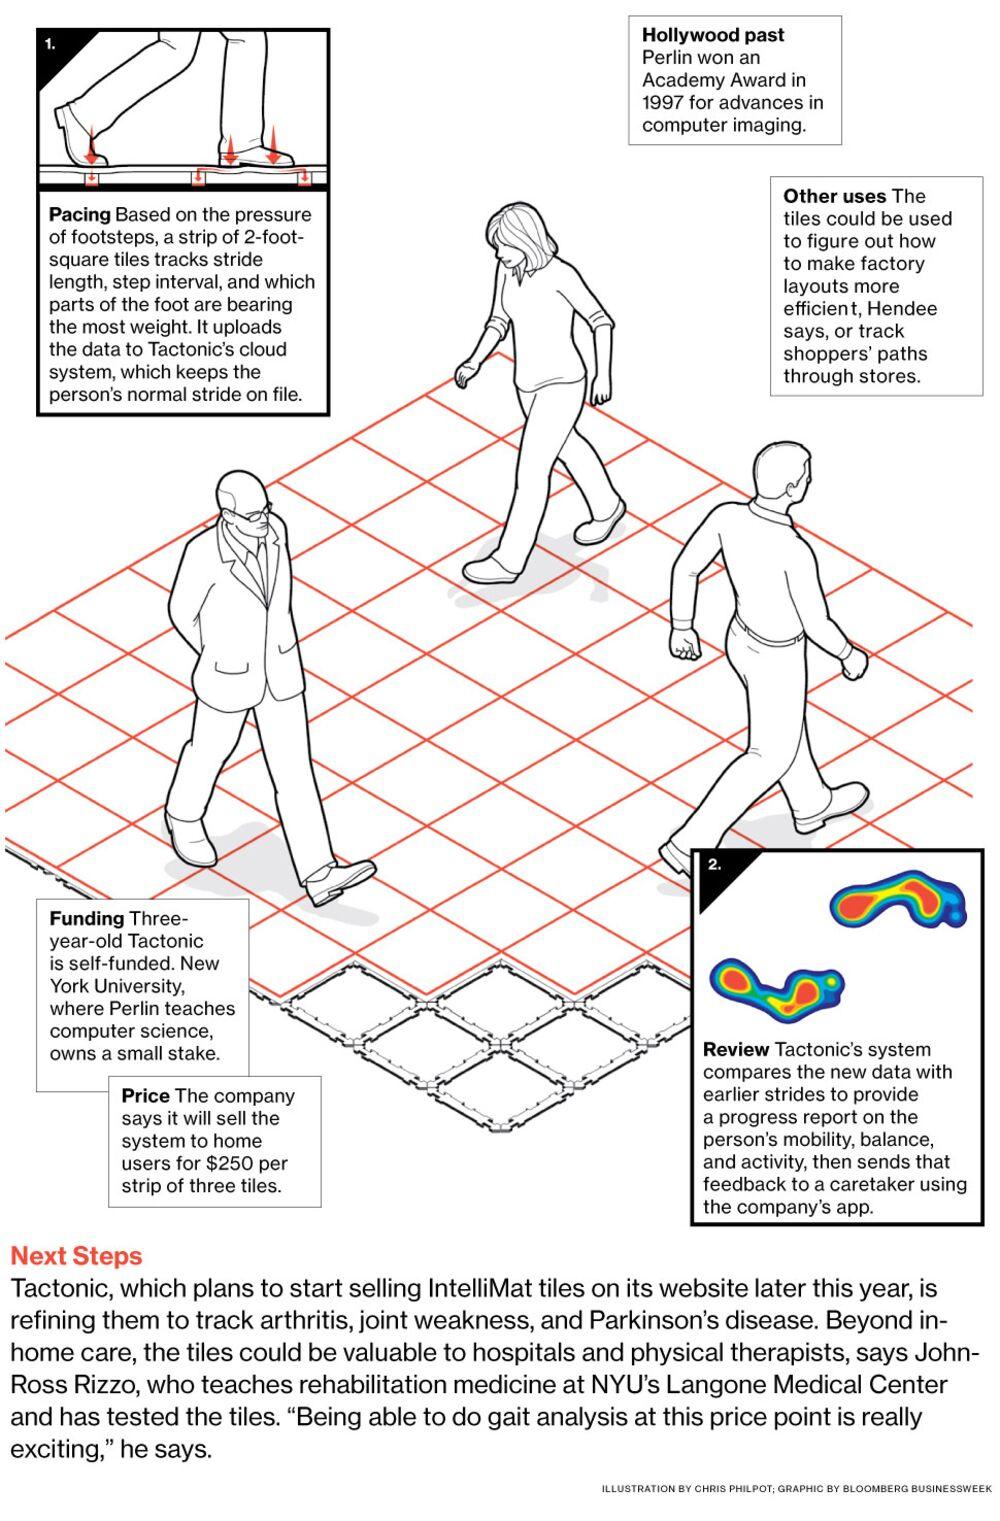 IntelliMat Flooring Measures Health Based on Footstep